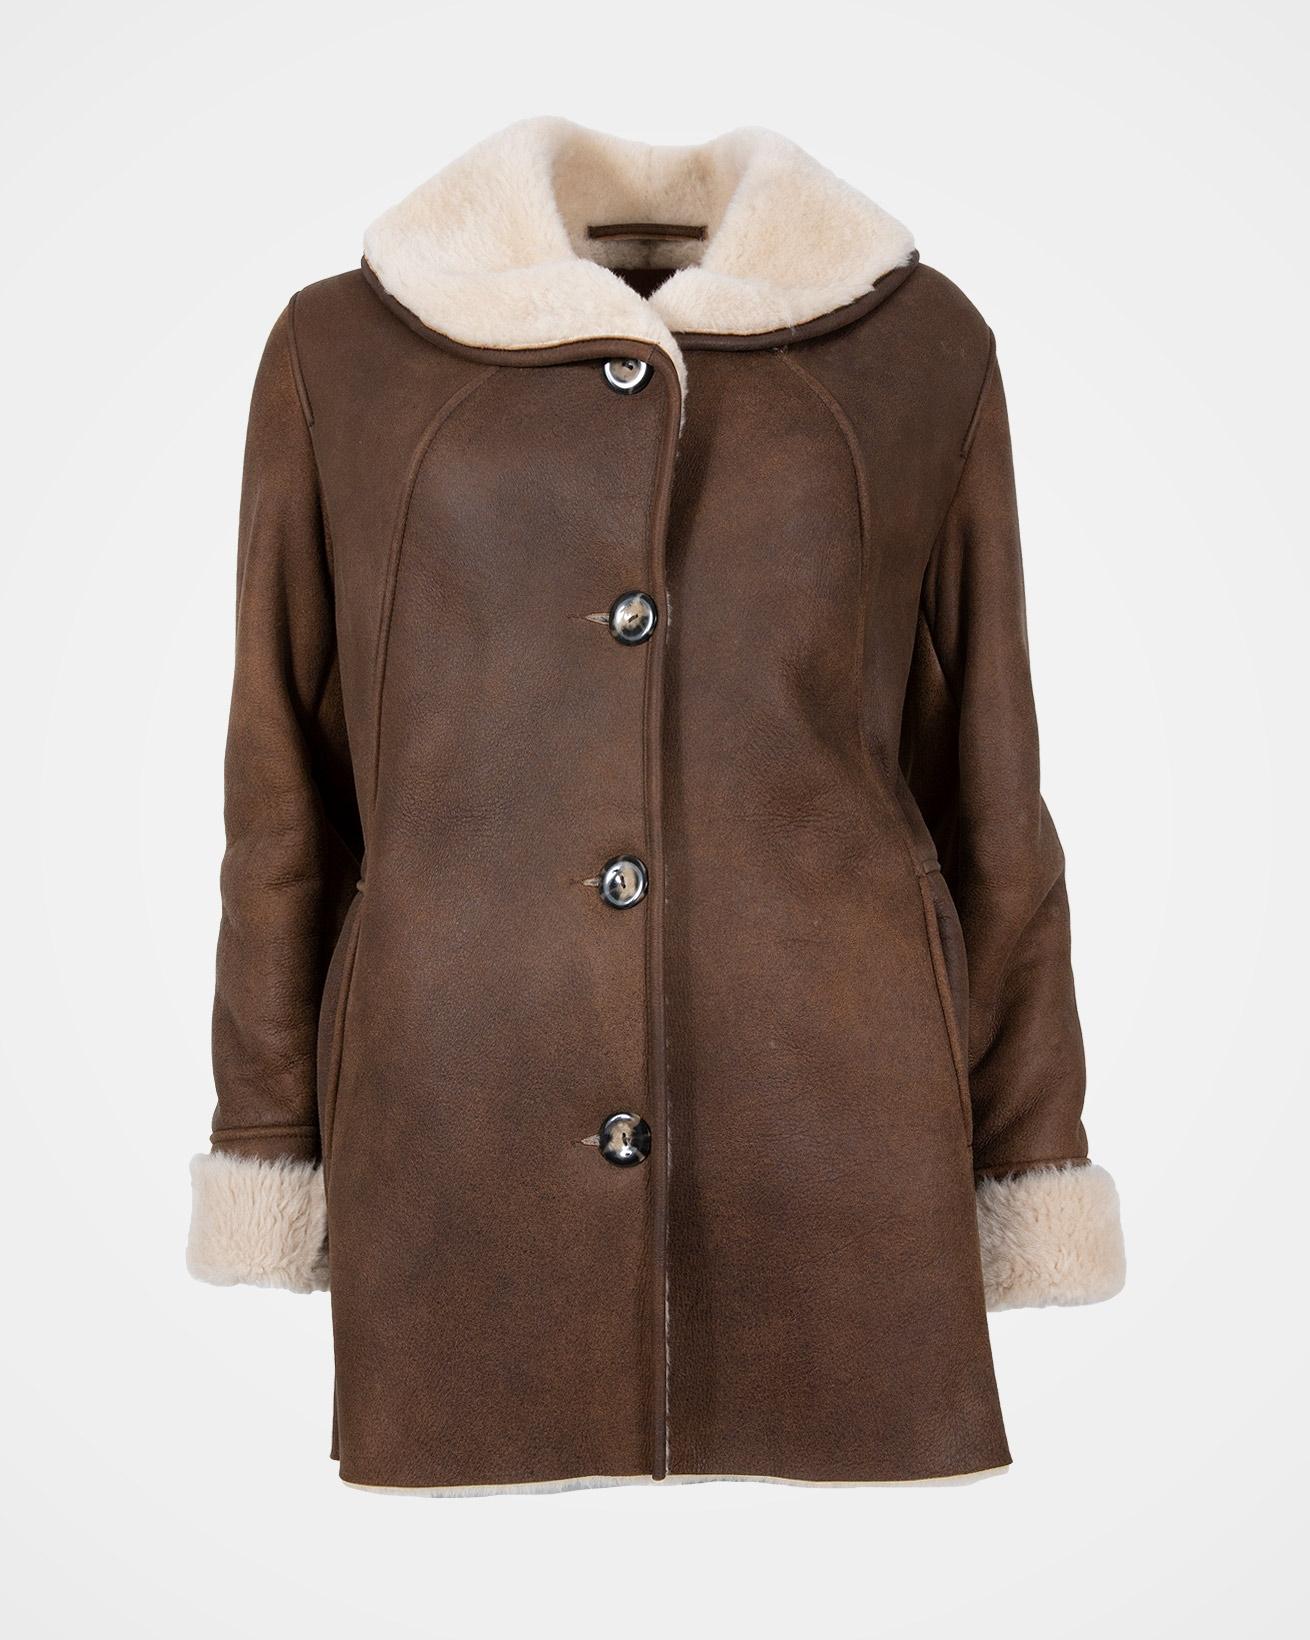 7778_londonder-sheepskin-jacket_front.jpg